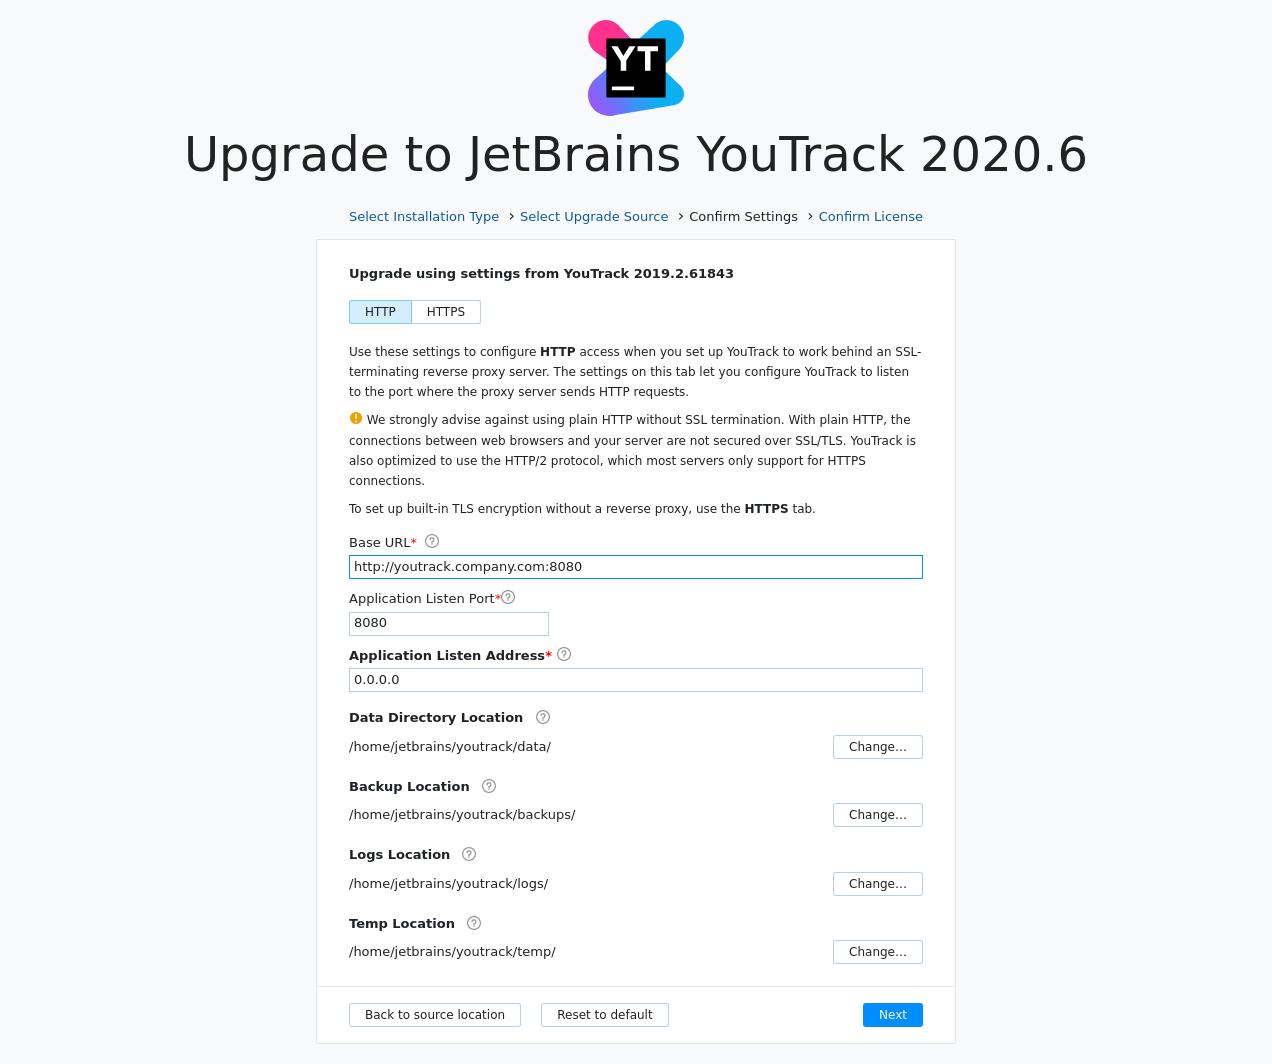 YouTrack JAR upgrade settings